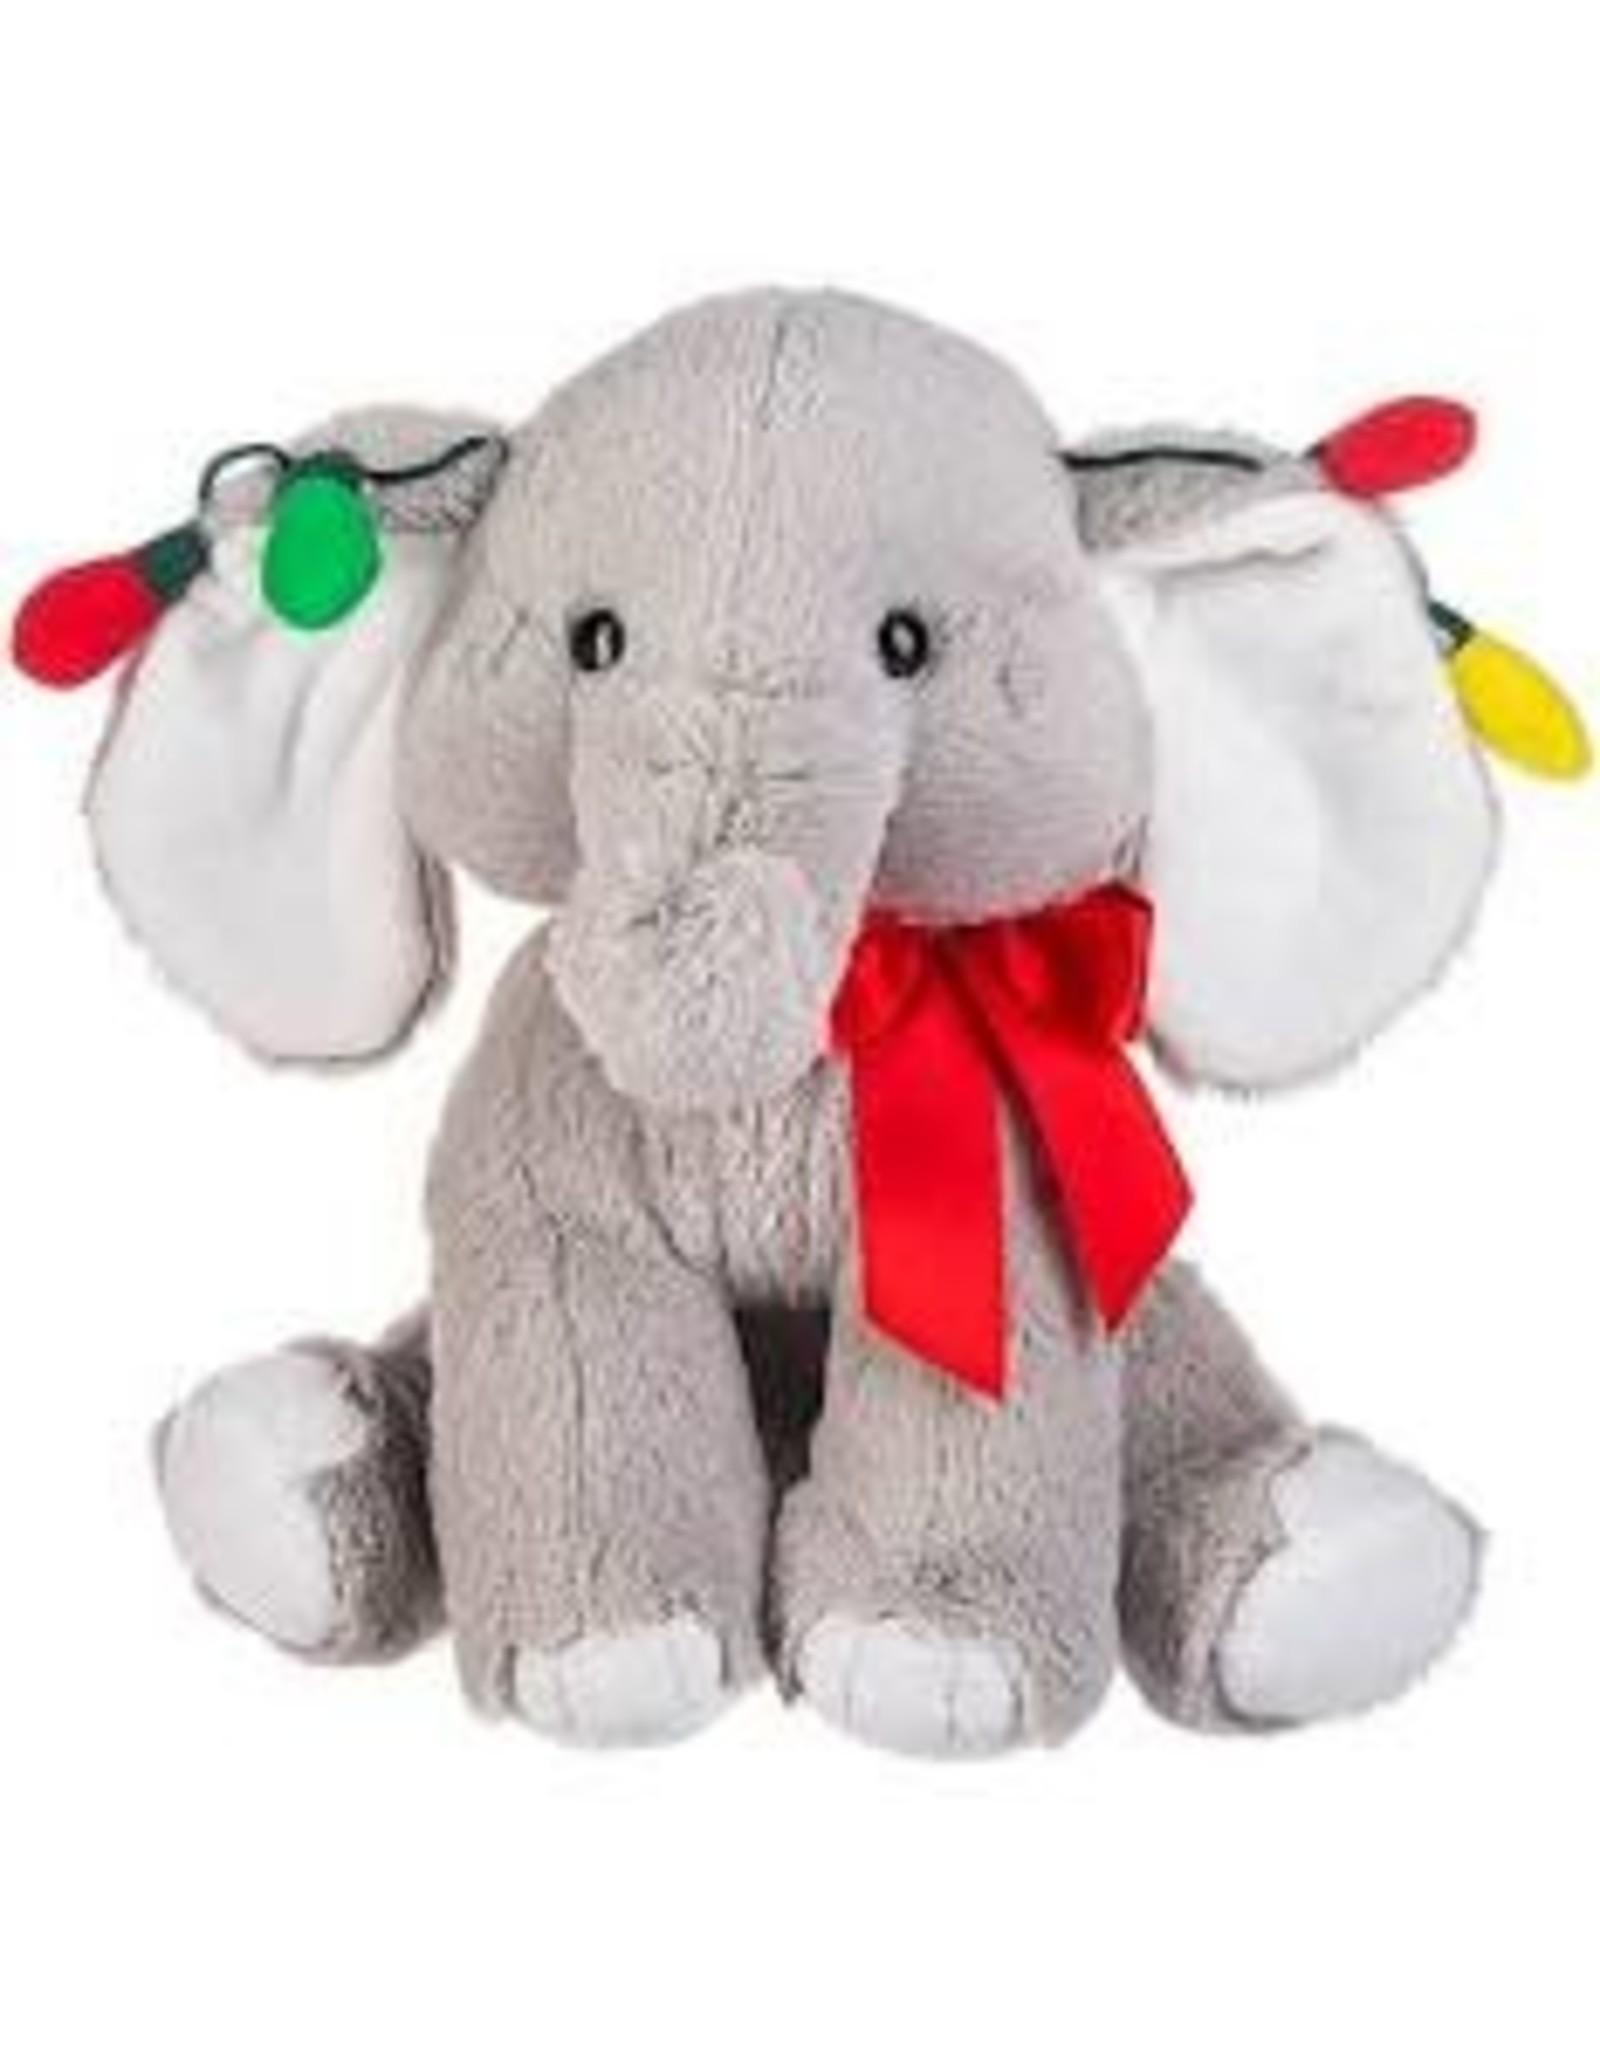 GANZ Christmas Elephant with Lights